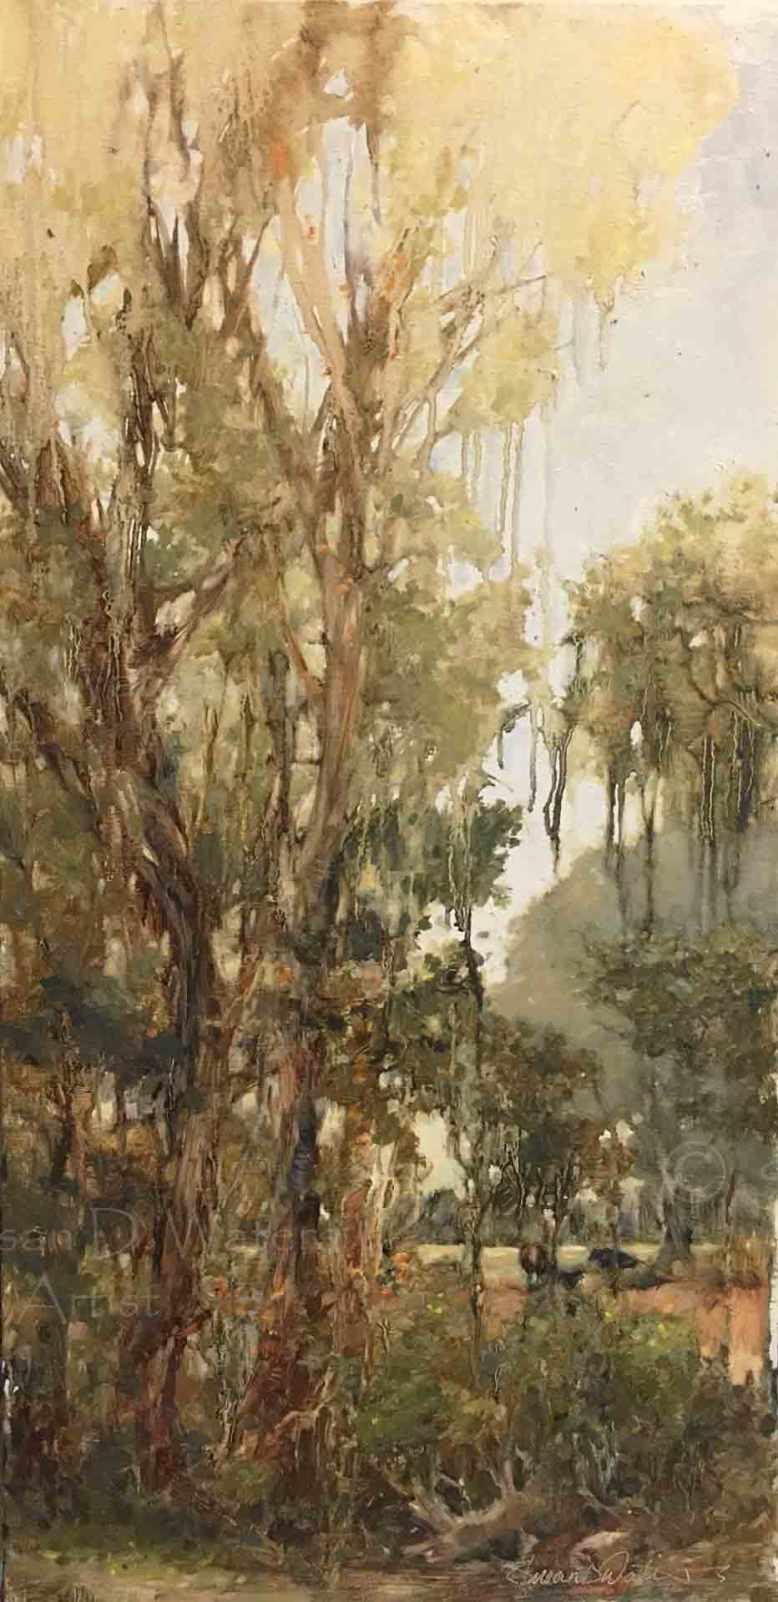 Across-the-Creek-Through-Vines,-Susan-Duke-Waters